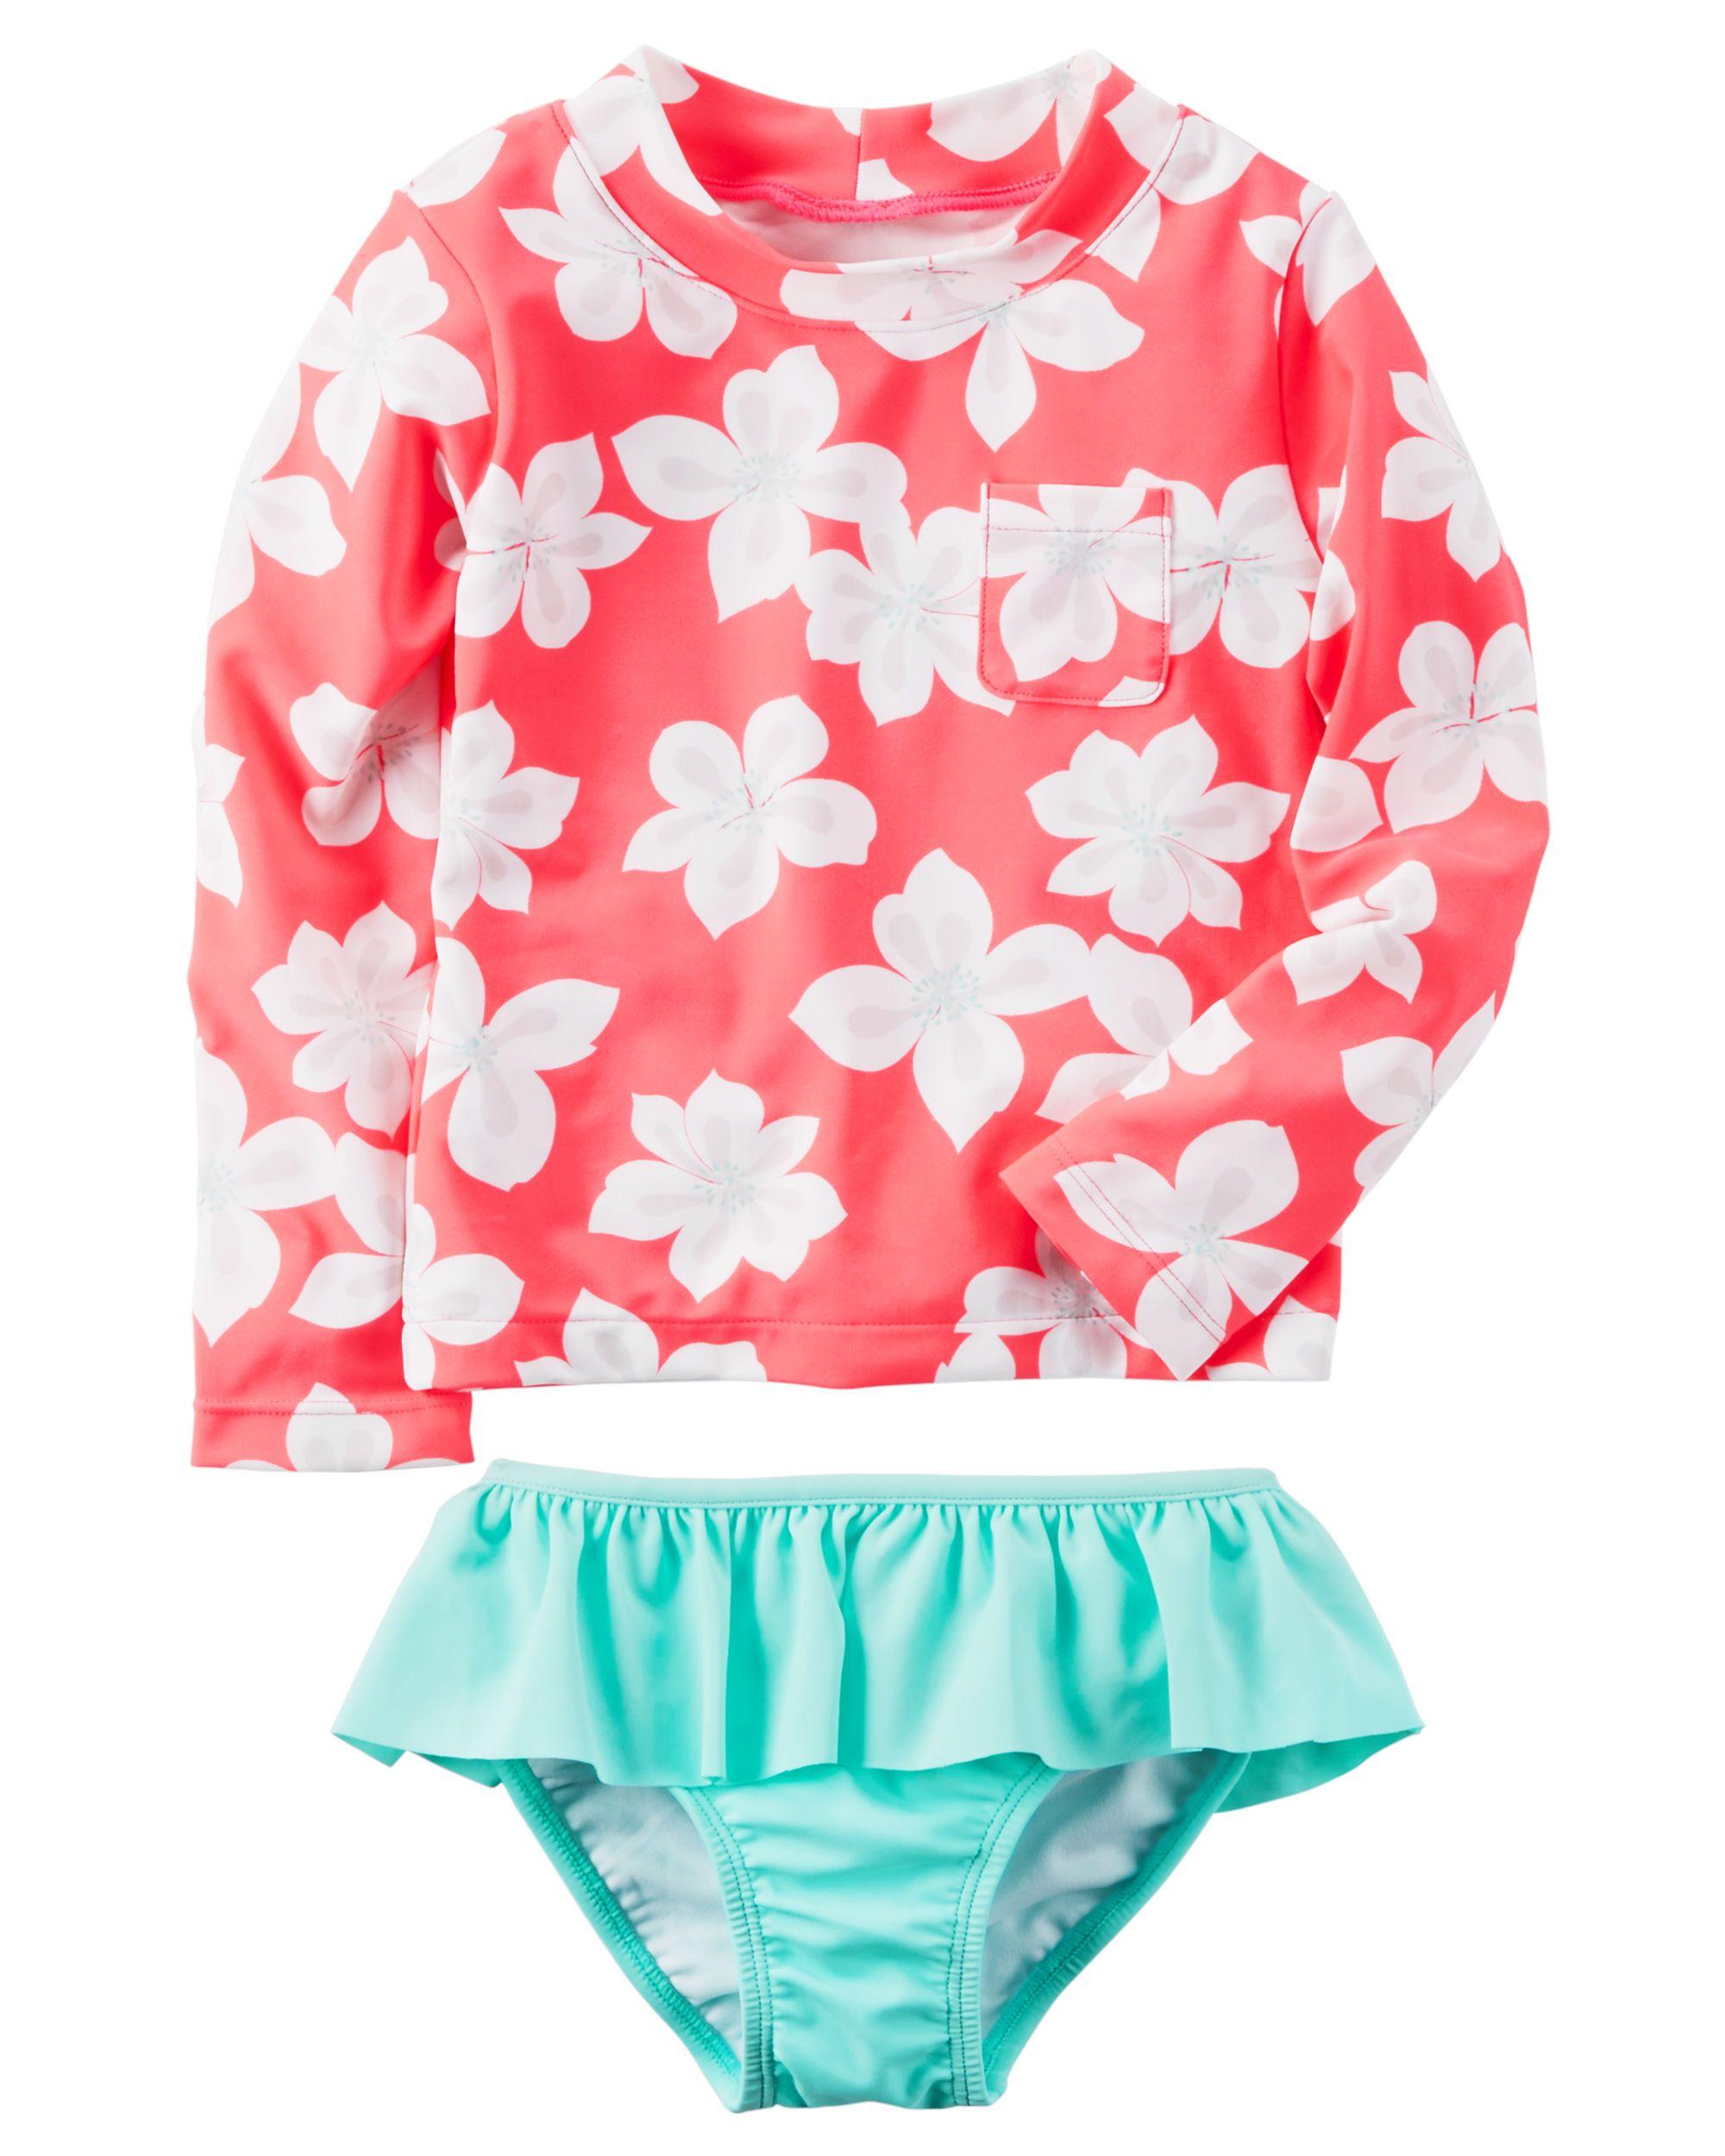 1ecc813a2 Swimwear Sale · Little Girl Fashion · Baby Swimming, Girls Swimming,  Carters Baby Girl, Toddler Girl, Baby Kids,